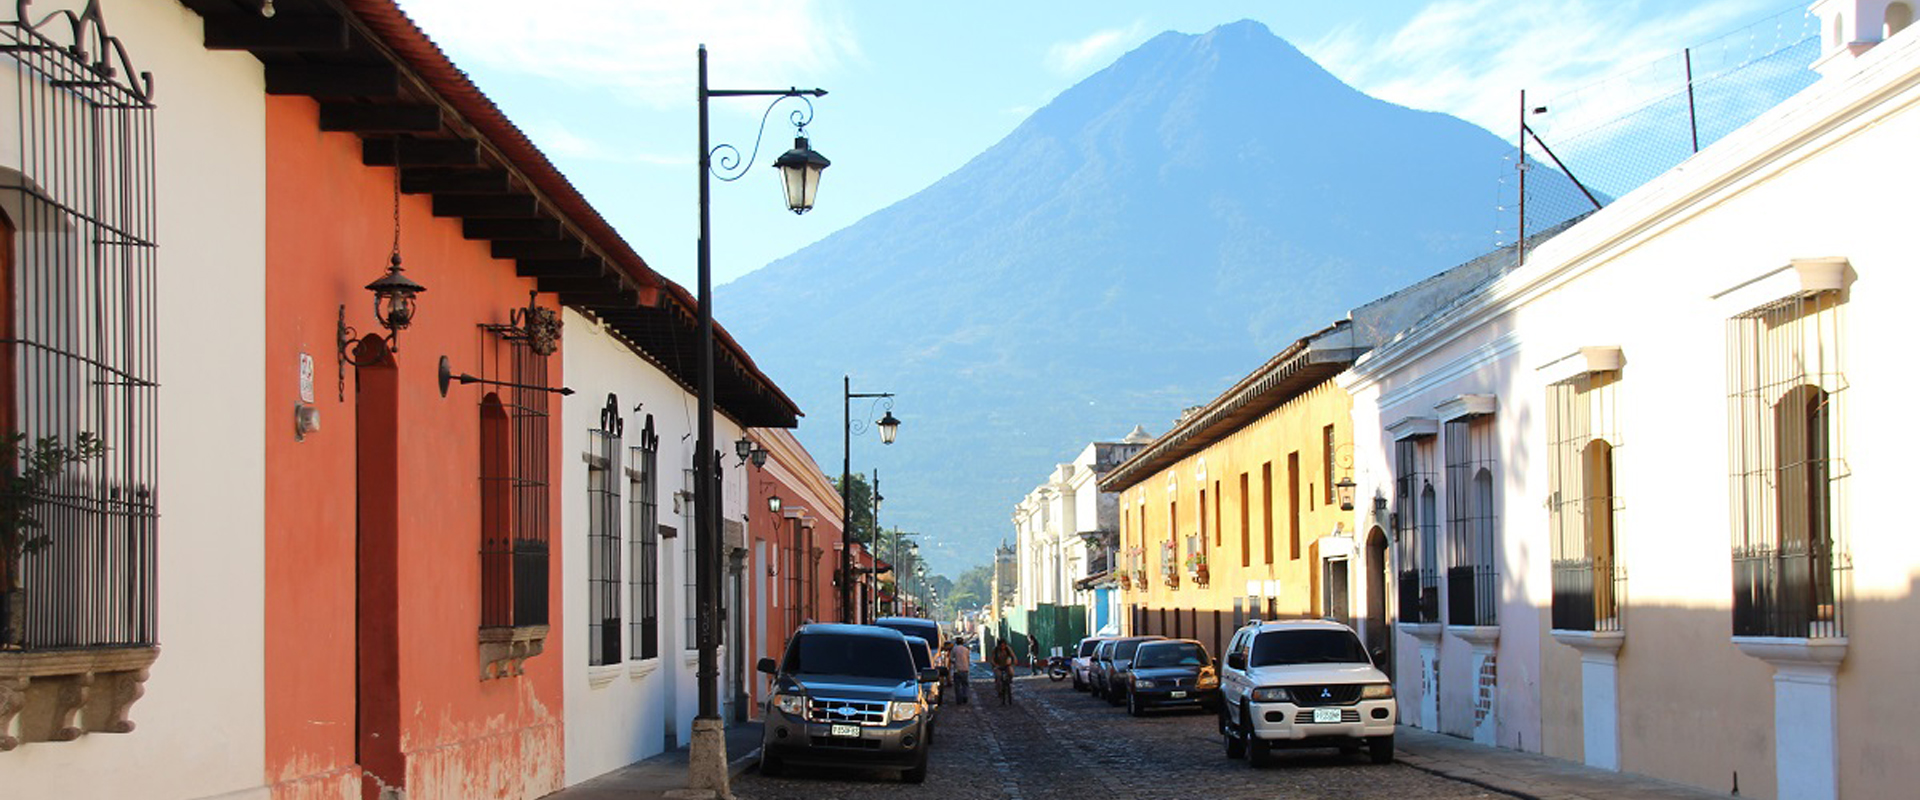 Guatemala, la joya maya de Centroamérica